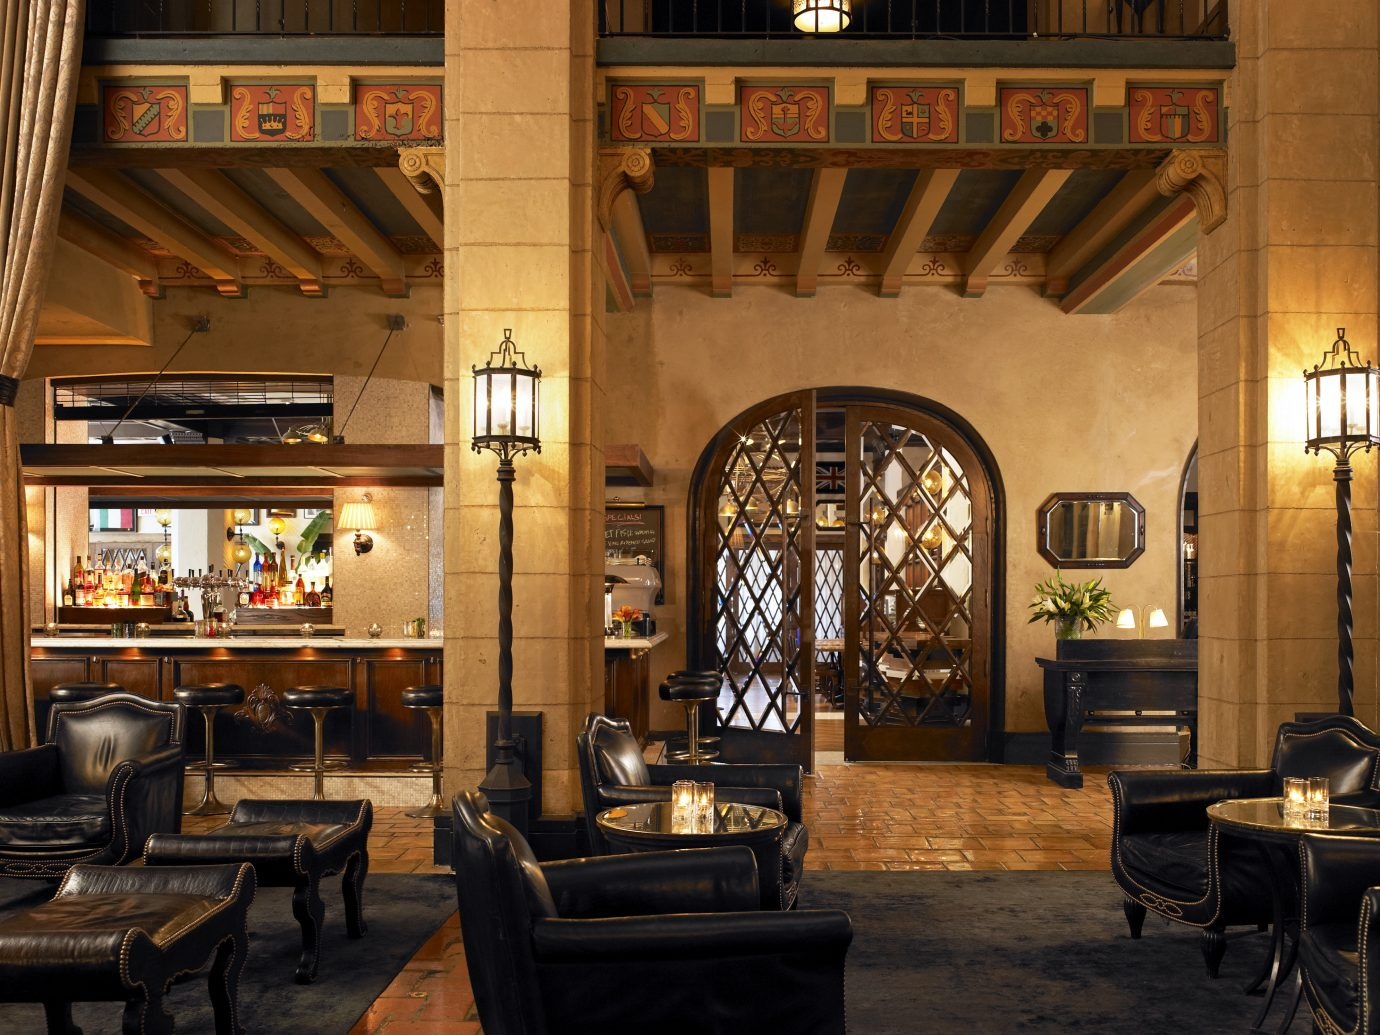 Architecture Bar Dining Drink Eat Historic Hotels Lobby Lounge Luxury Romance indoor Living floor room chair estate interior design restaurant lighting furniture area